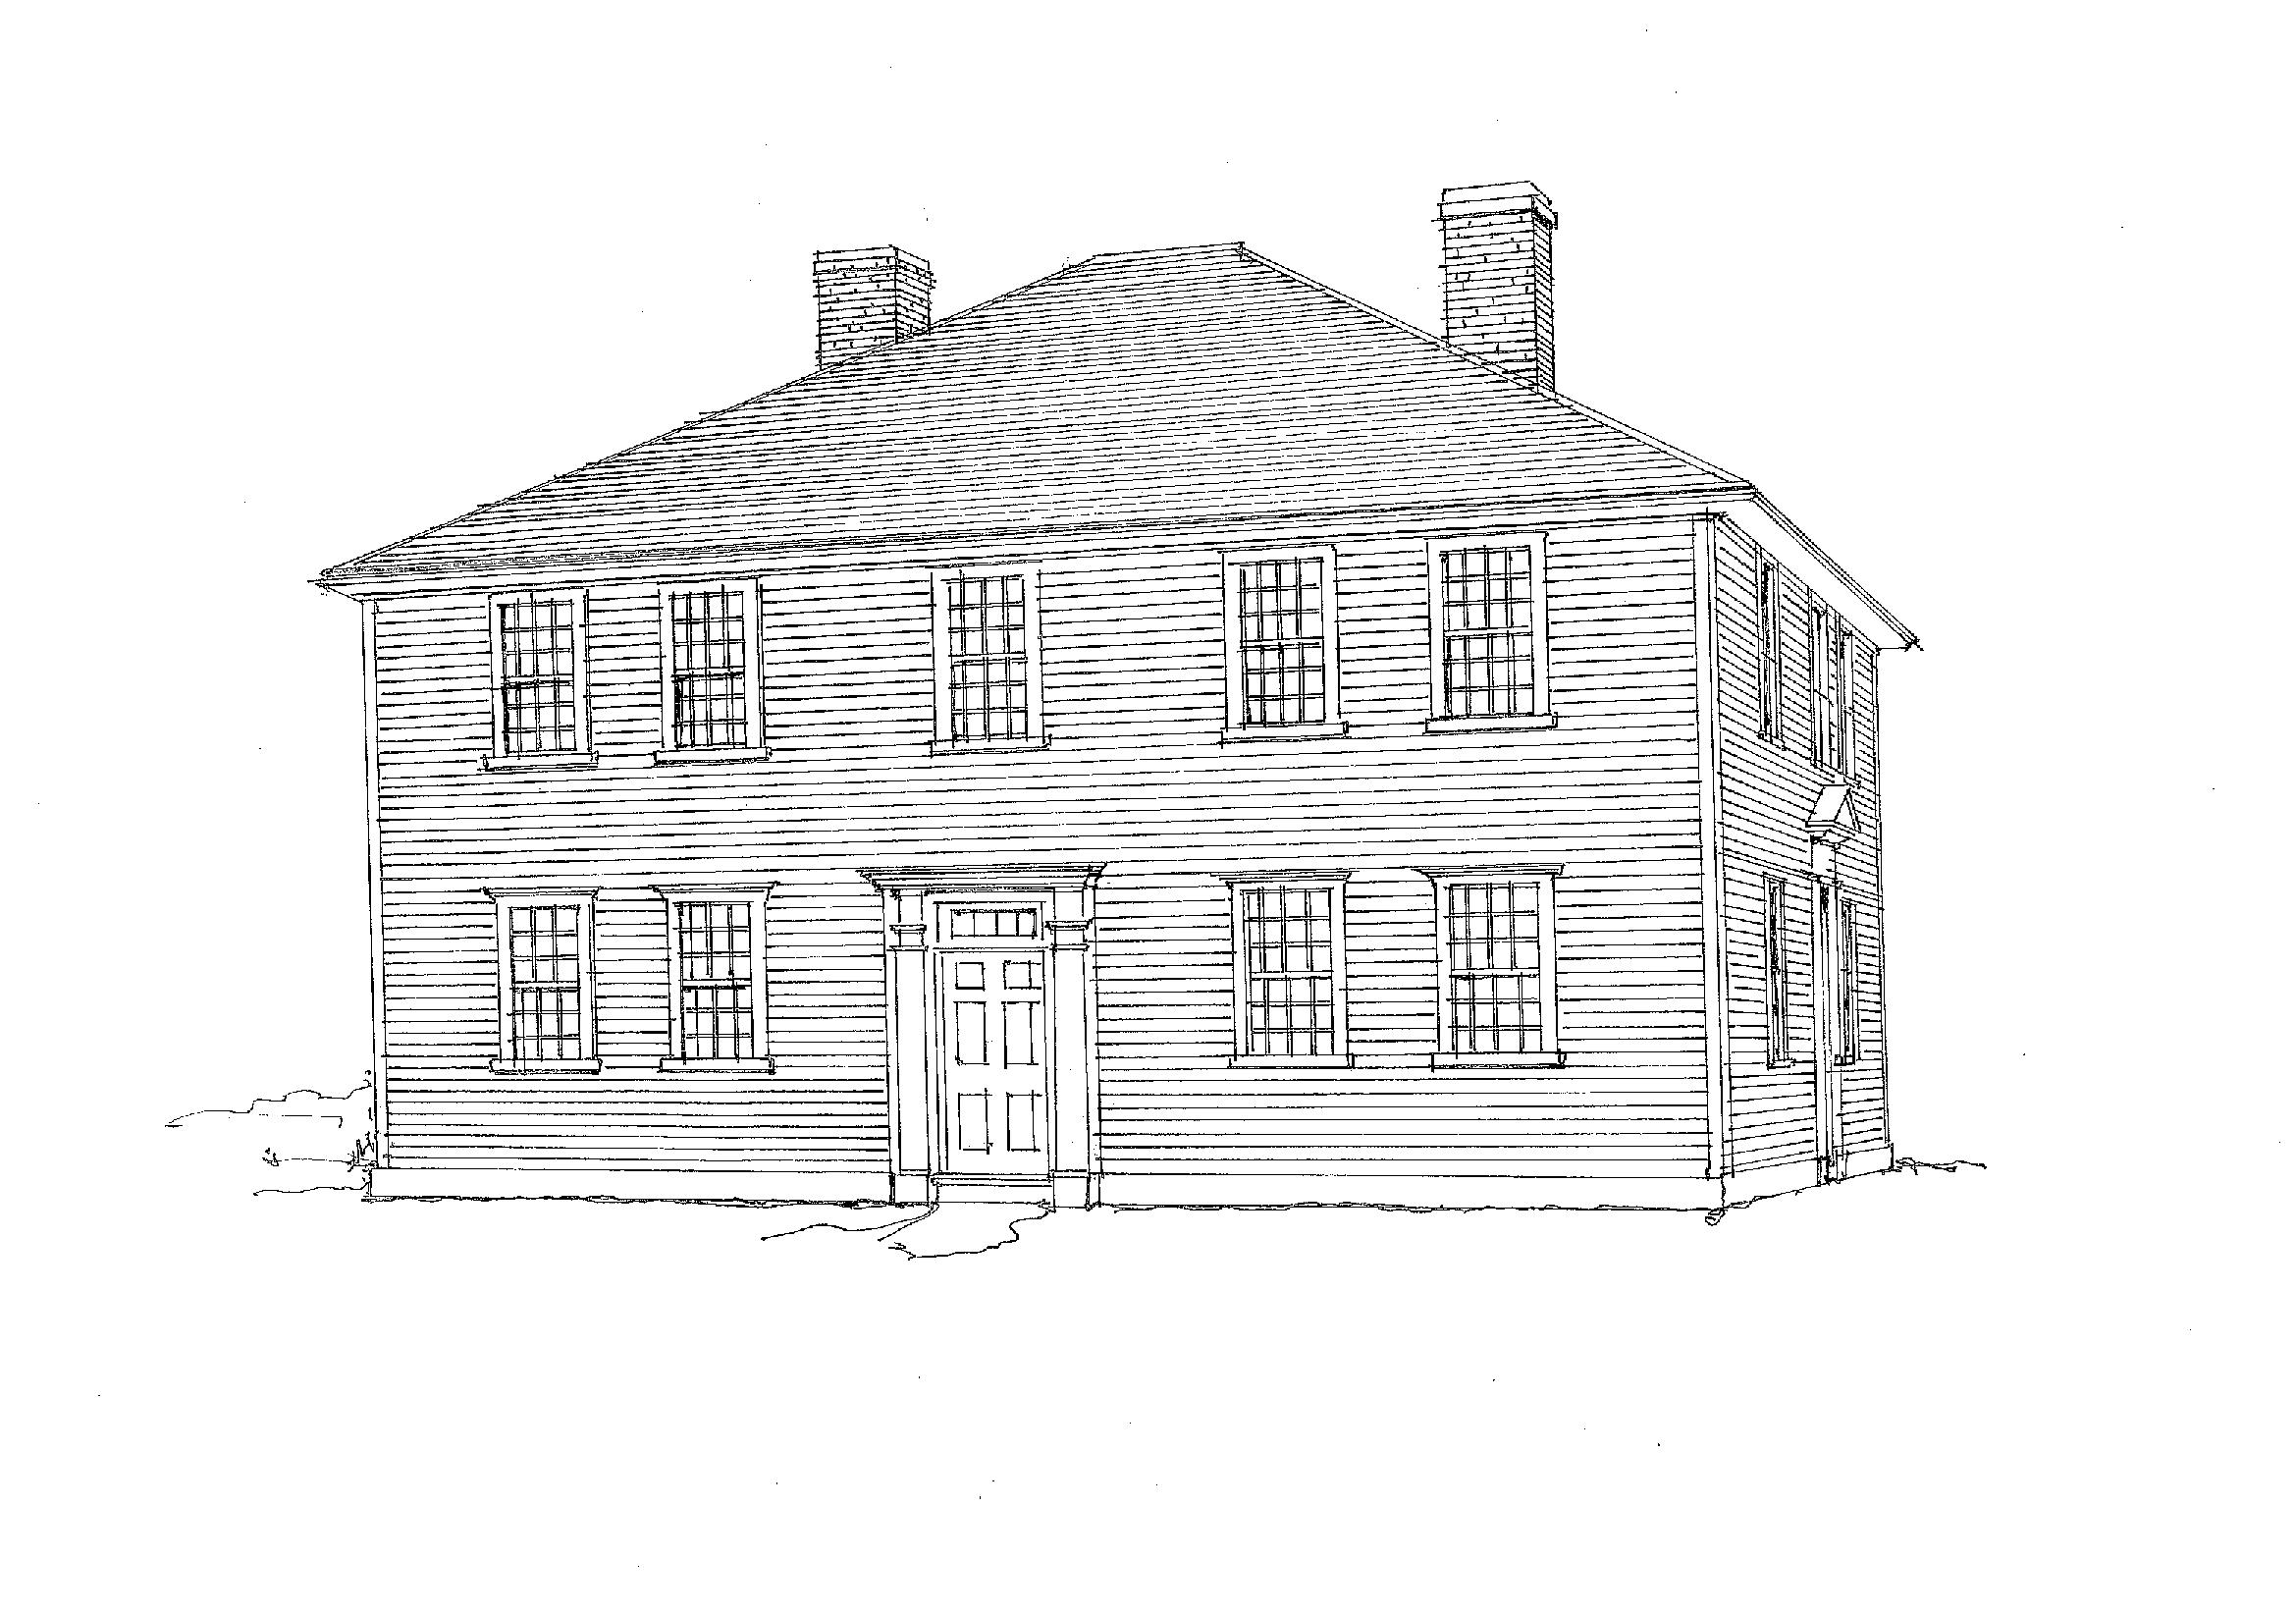 General Rufus Putnam House (ca. 1750)